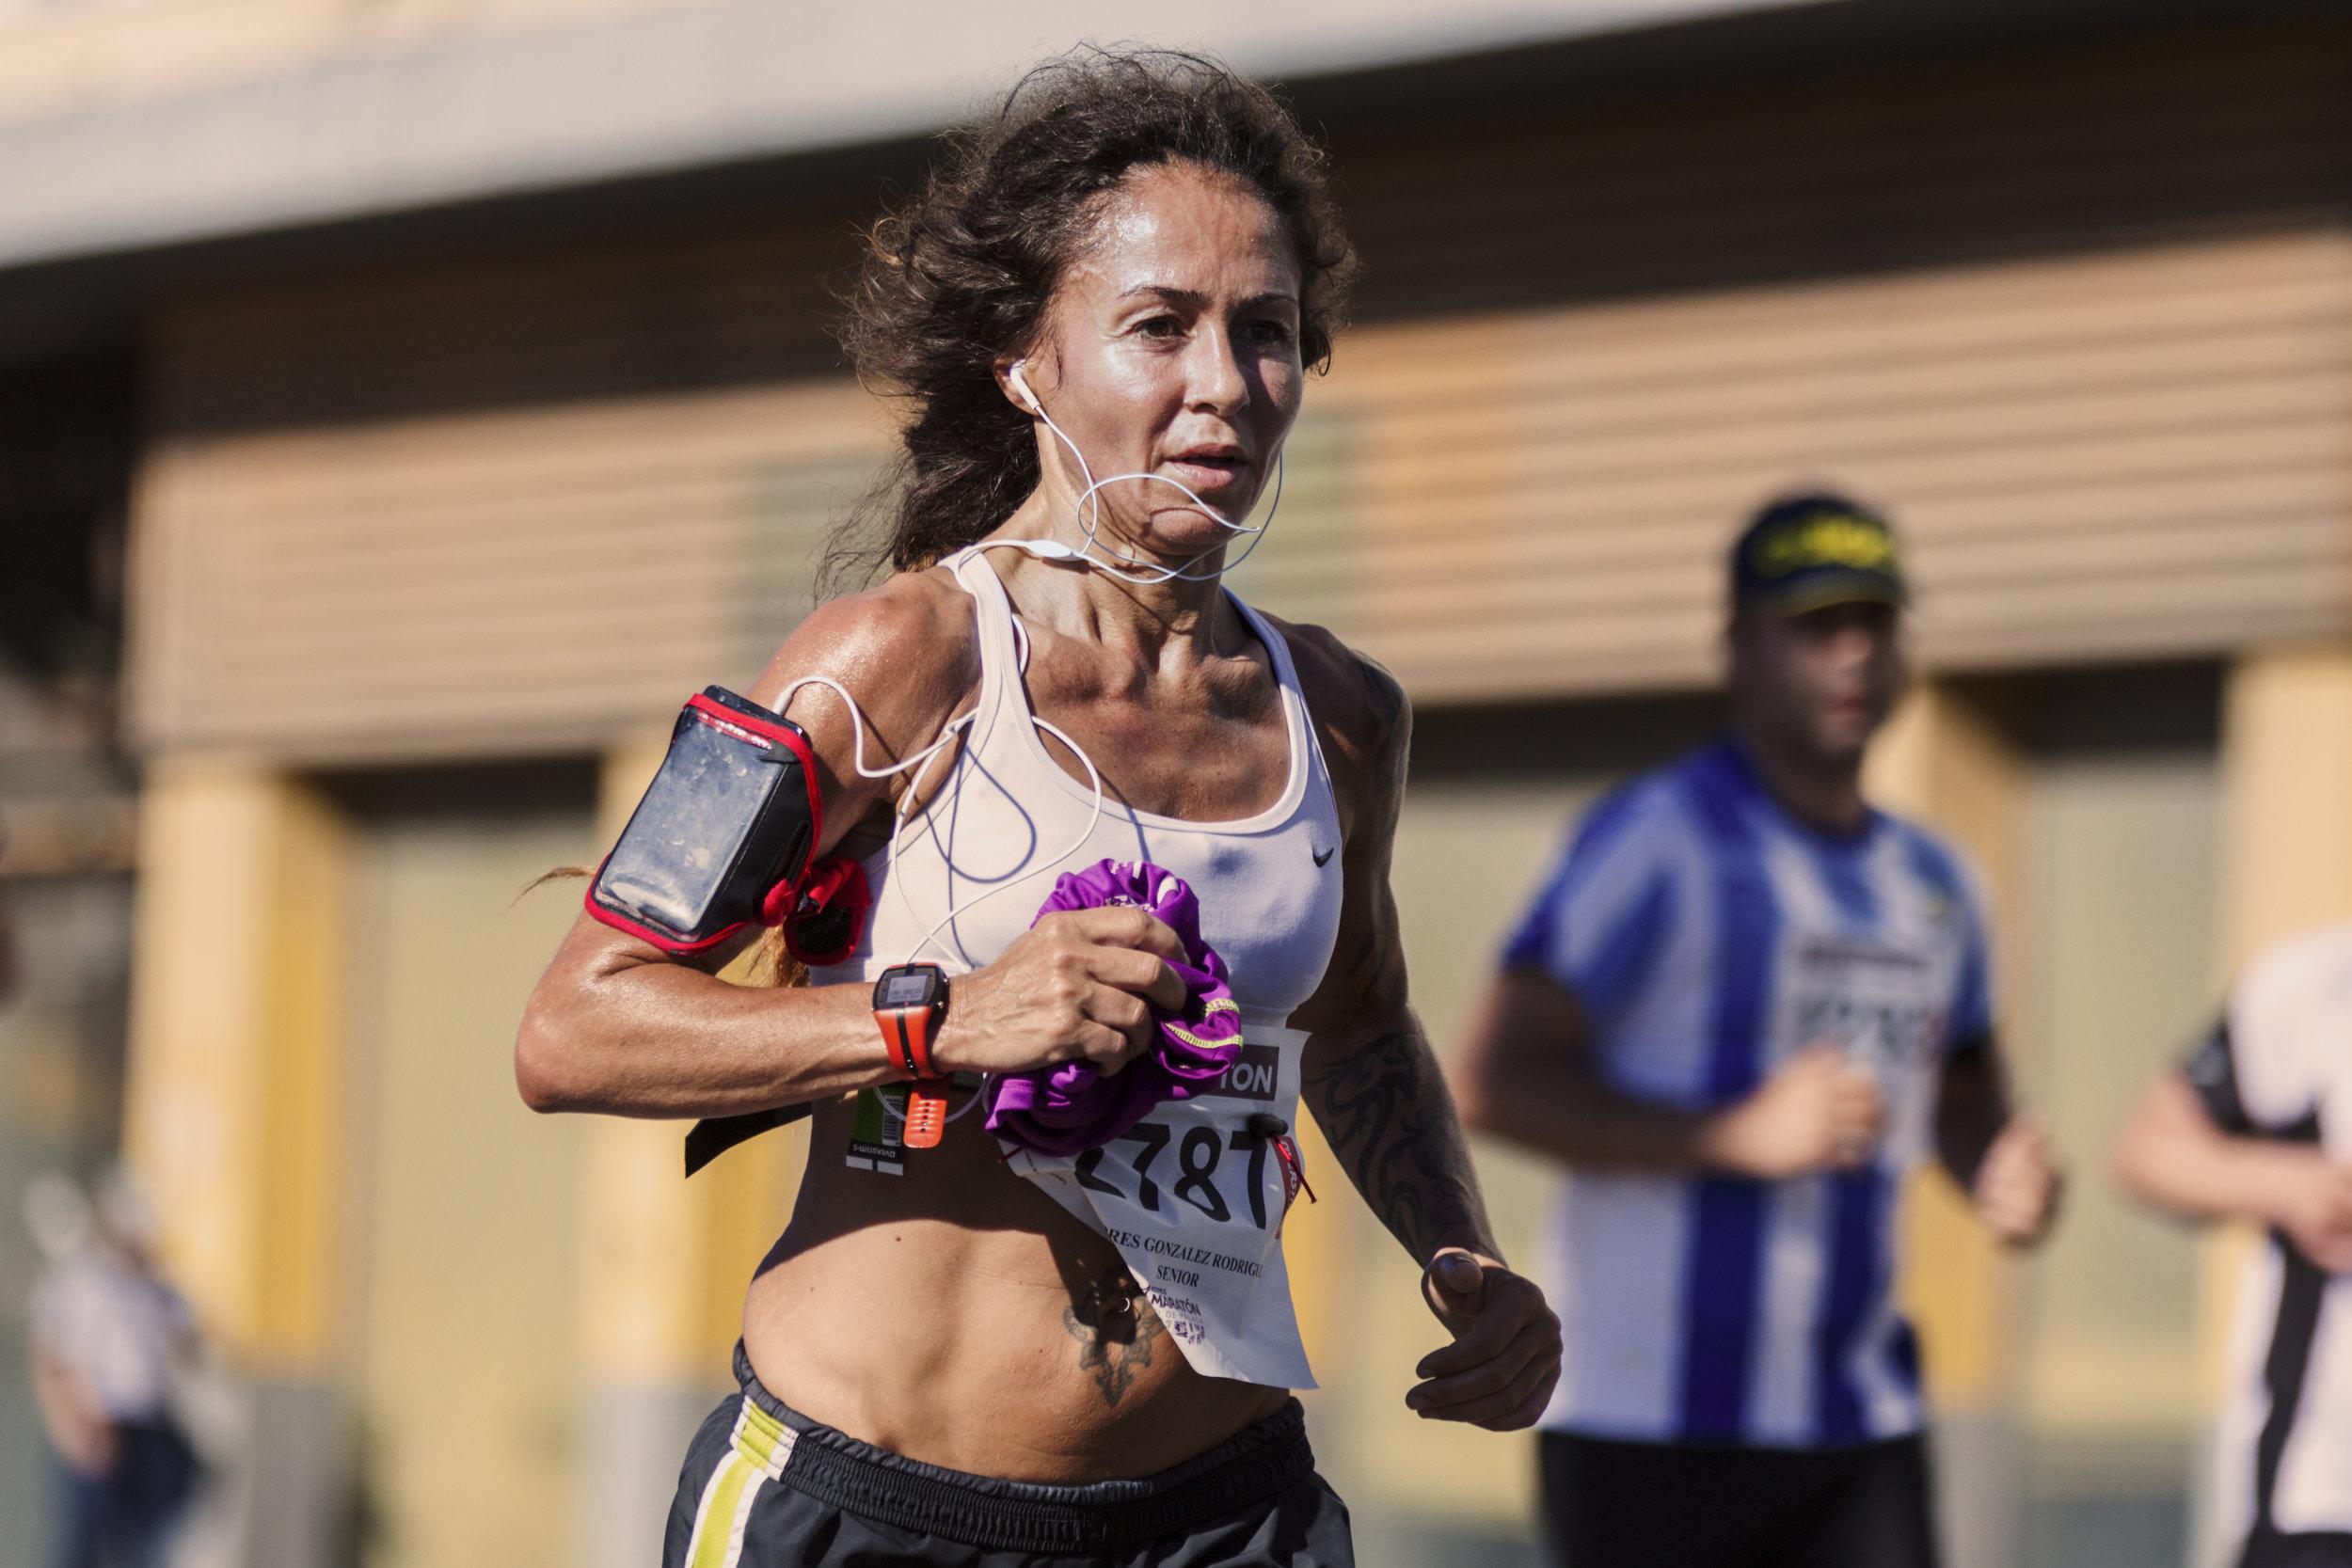 runners gait stride tough running coach shelly Minnesota